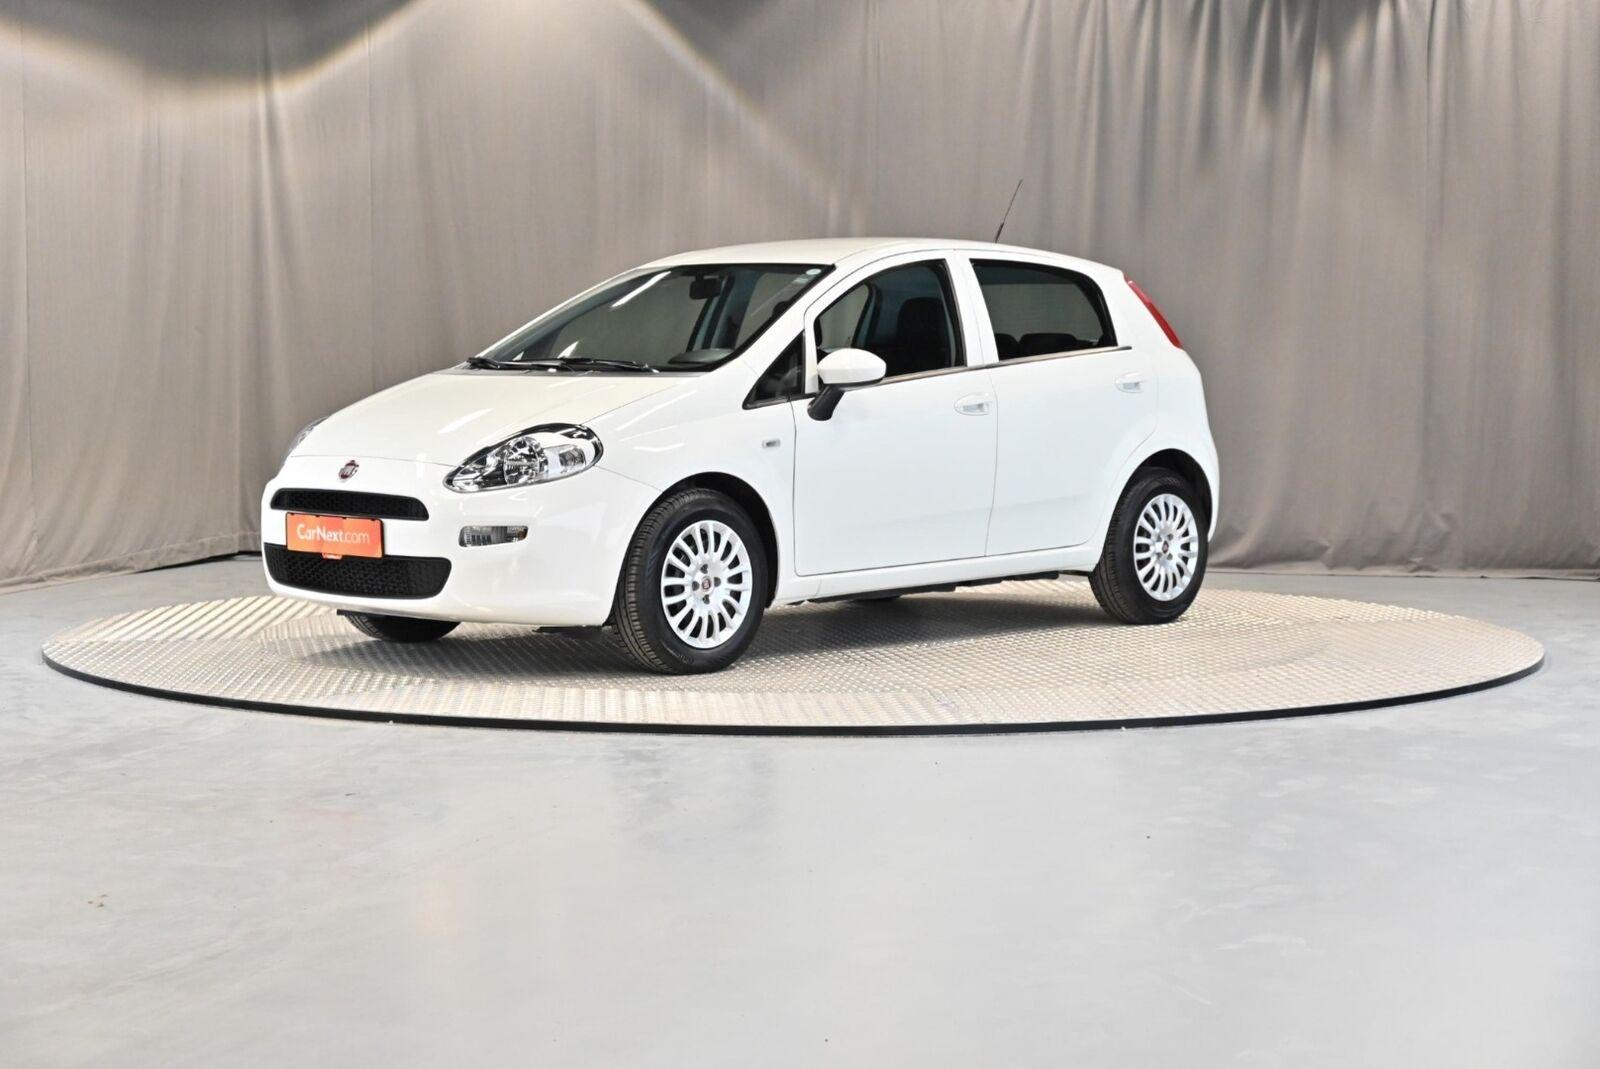 Fiat Punto 0,9 TwinAir 100 Popstar Edition 5d - 79.900 kr.